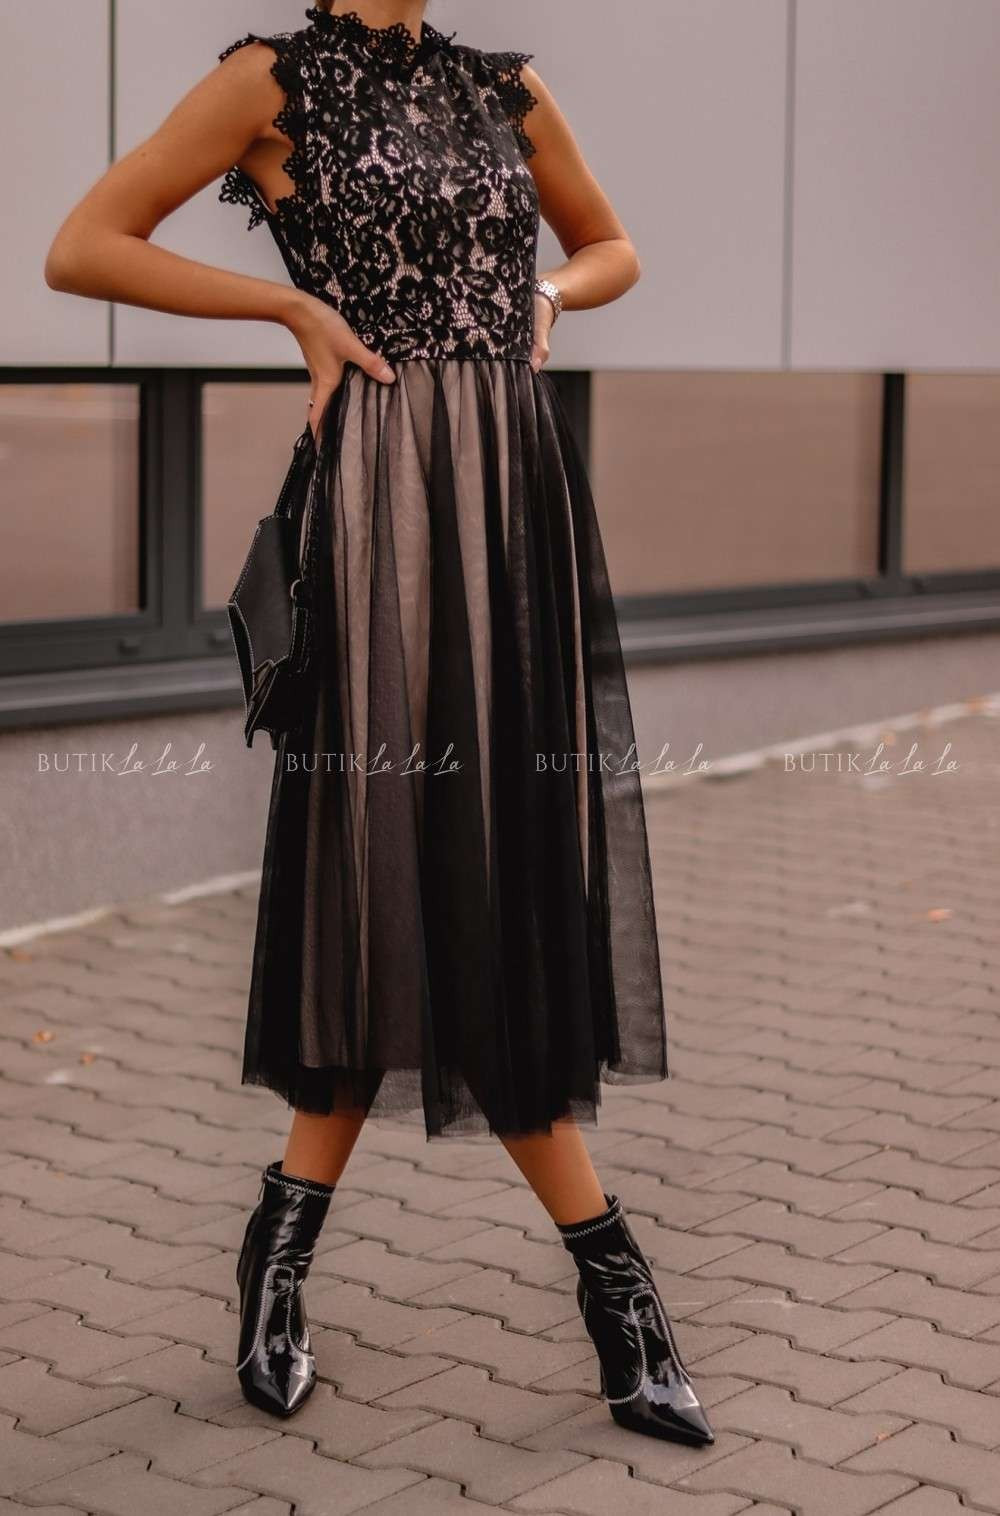 czarna sukienka ztiulem na dole